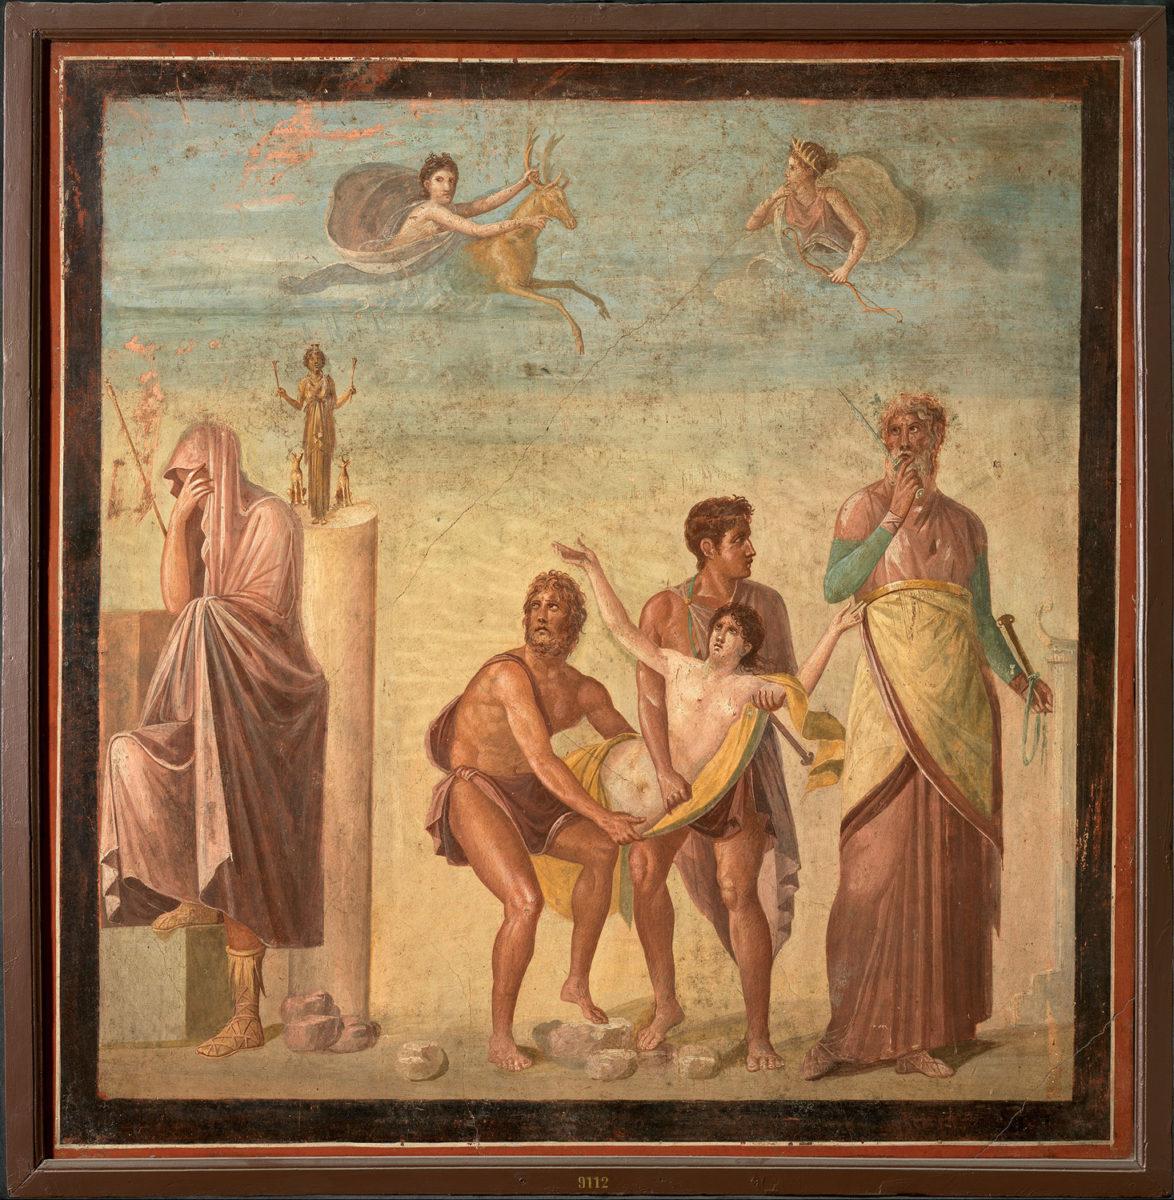 Wall painting with scene from the sacrifice of Iphigeneia. ca. 62–79 AD. Pompeii, Casa del Poeta Tragico. Napoli, Museo Archeologico Nazionale.